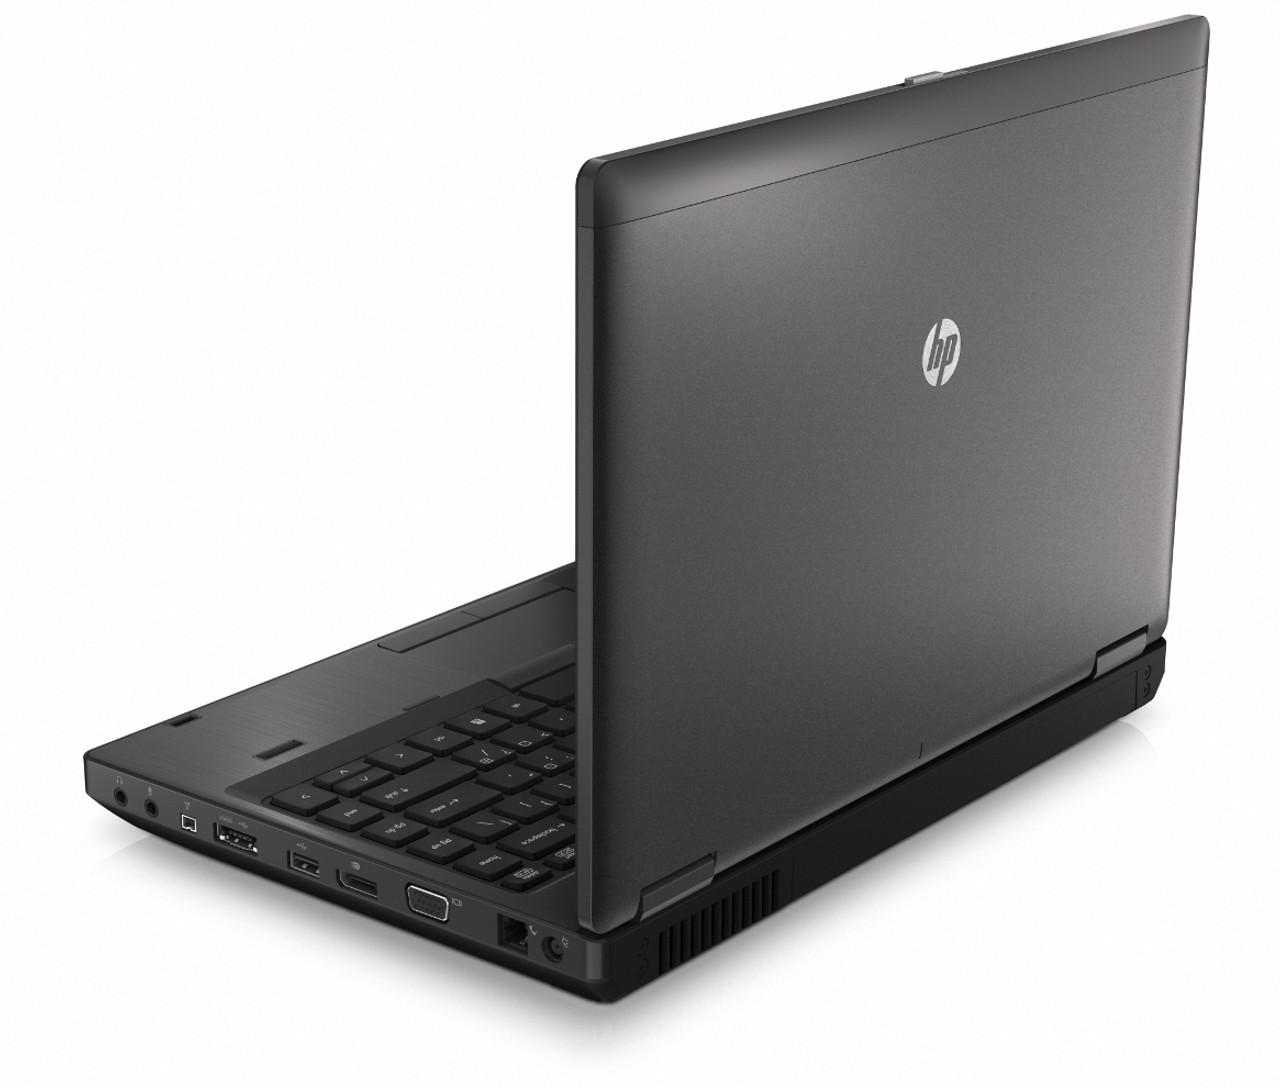 HP Compaq Probook 6360B Laptop Core i5 2.6GHz, 4GB Ram, 320GB HDD, DVD-RW, Windows 10 Pro 64 Notebook